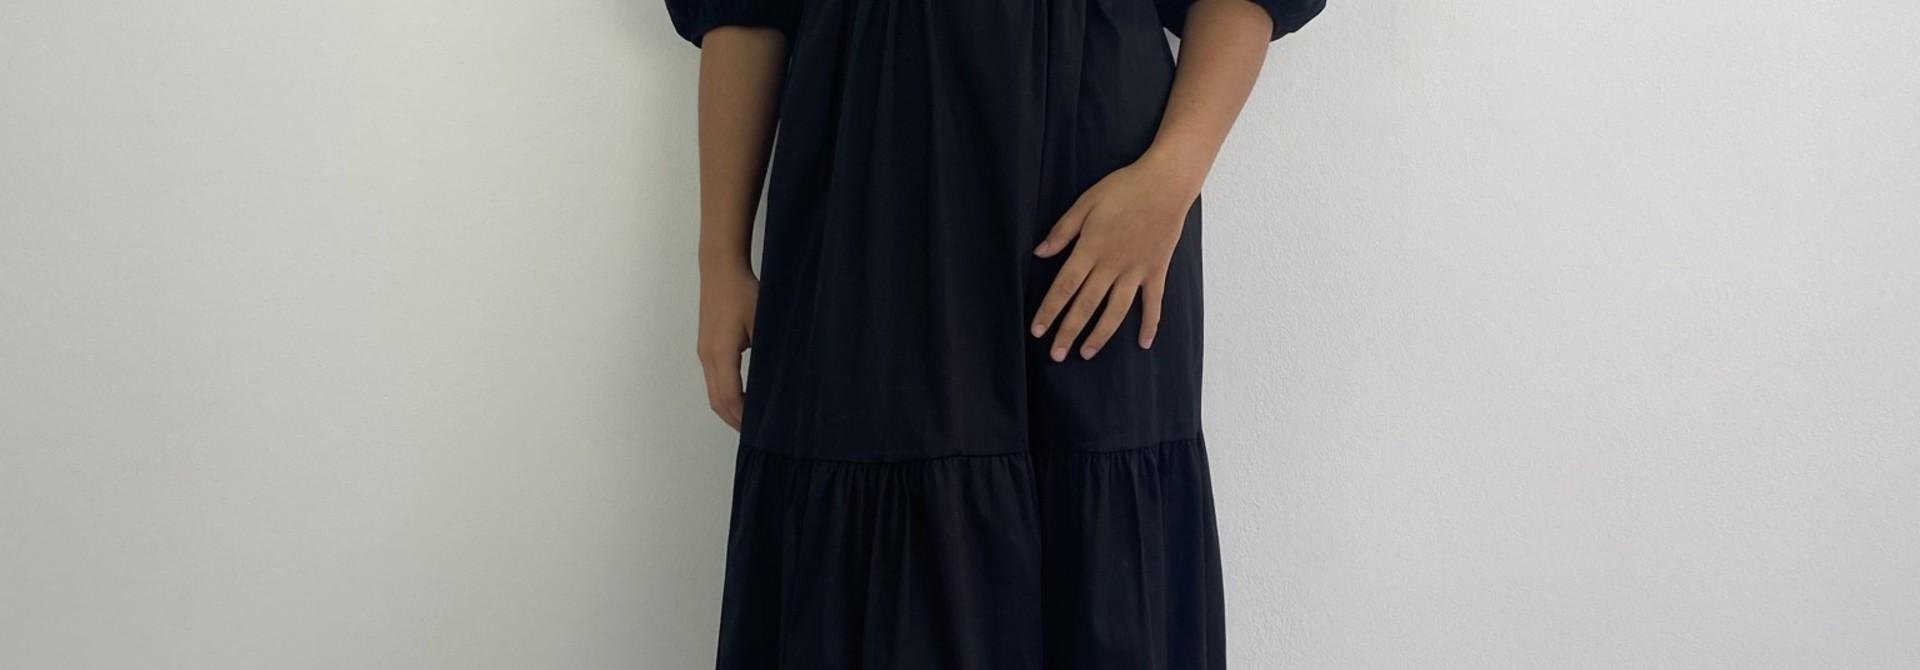 Beth urban shirtdress Black